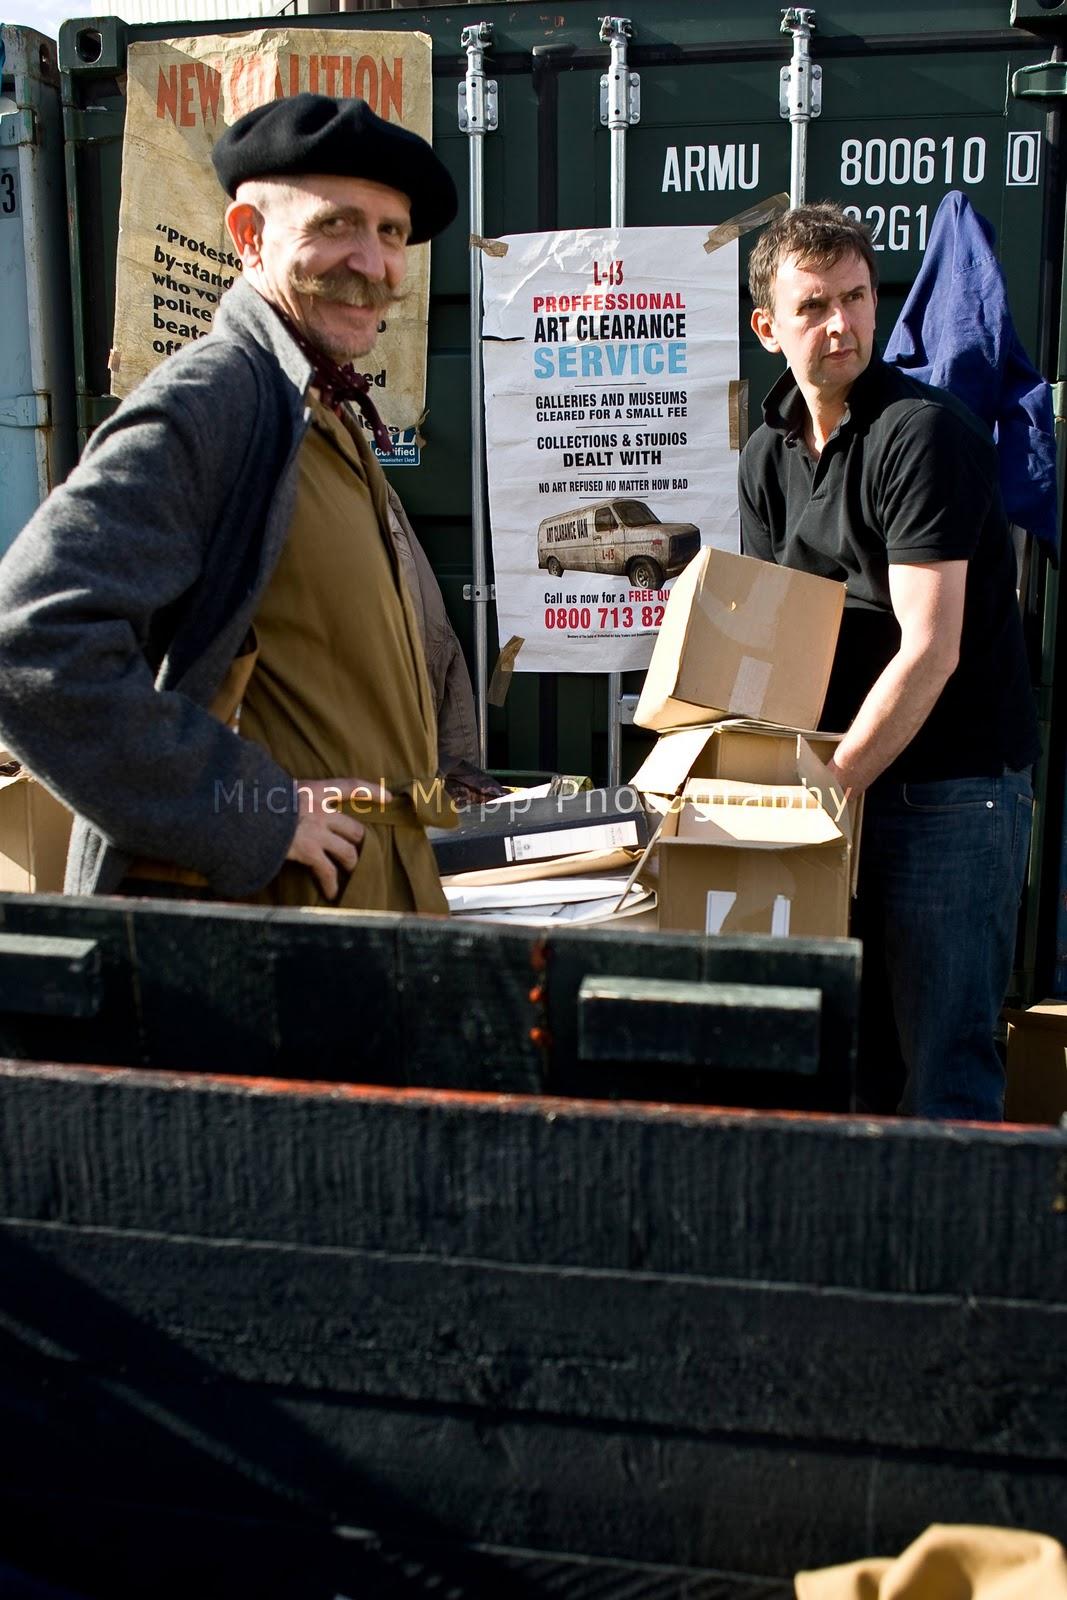 http://4.bp.blogspot.com/-WYSc5ZdXHHQ/TxYO6IjOvcI/AAAAAAAAA4A/2BjFhnlzbPY/s1600/Vauxhall-Arts-Car-Boot-Sale-197.jpg